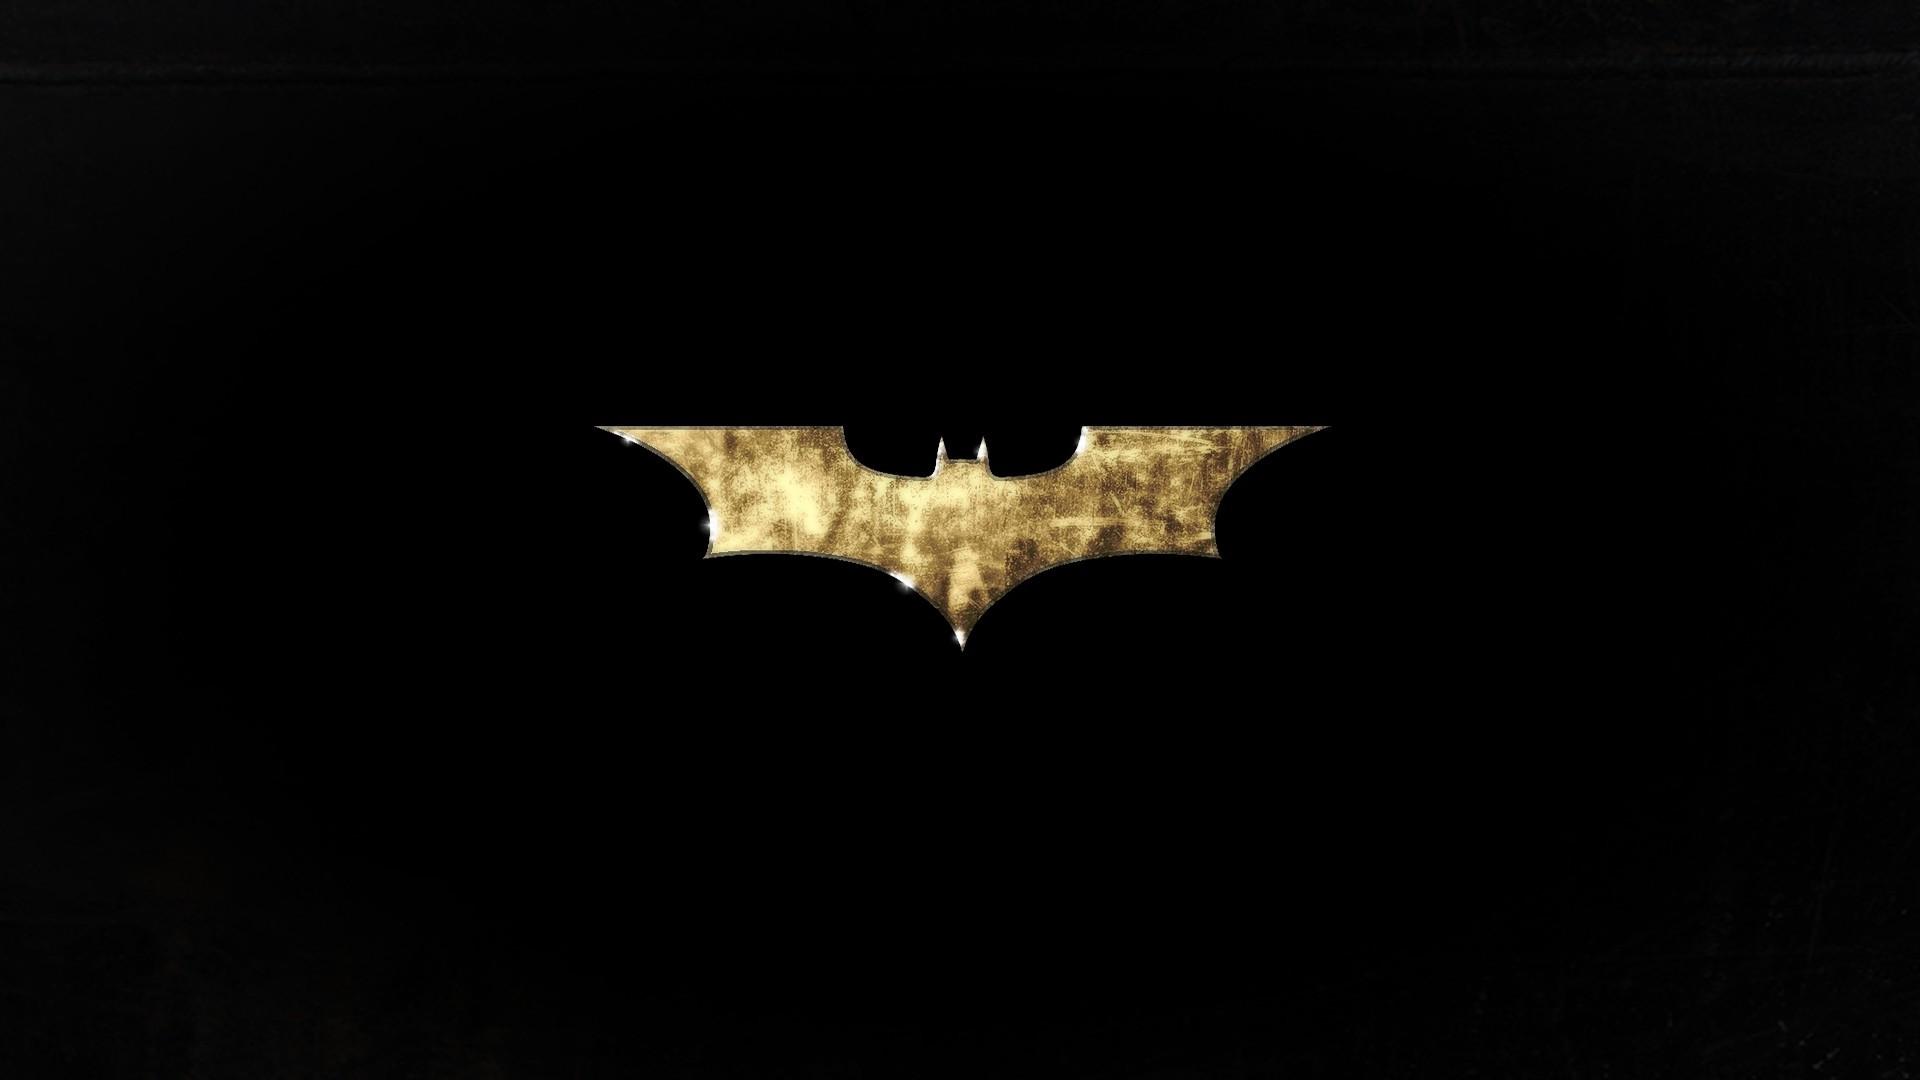 1920x1080 Px Batman Begins